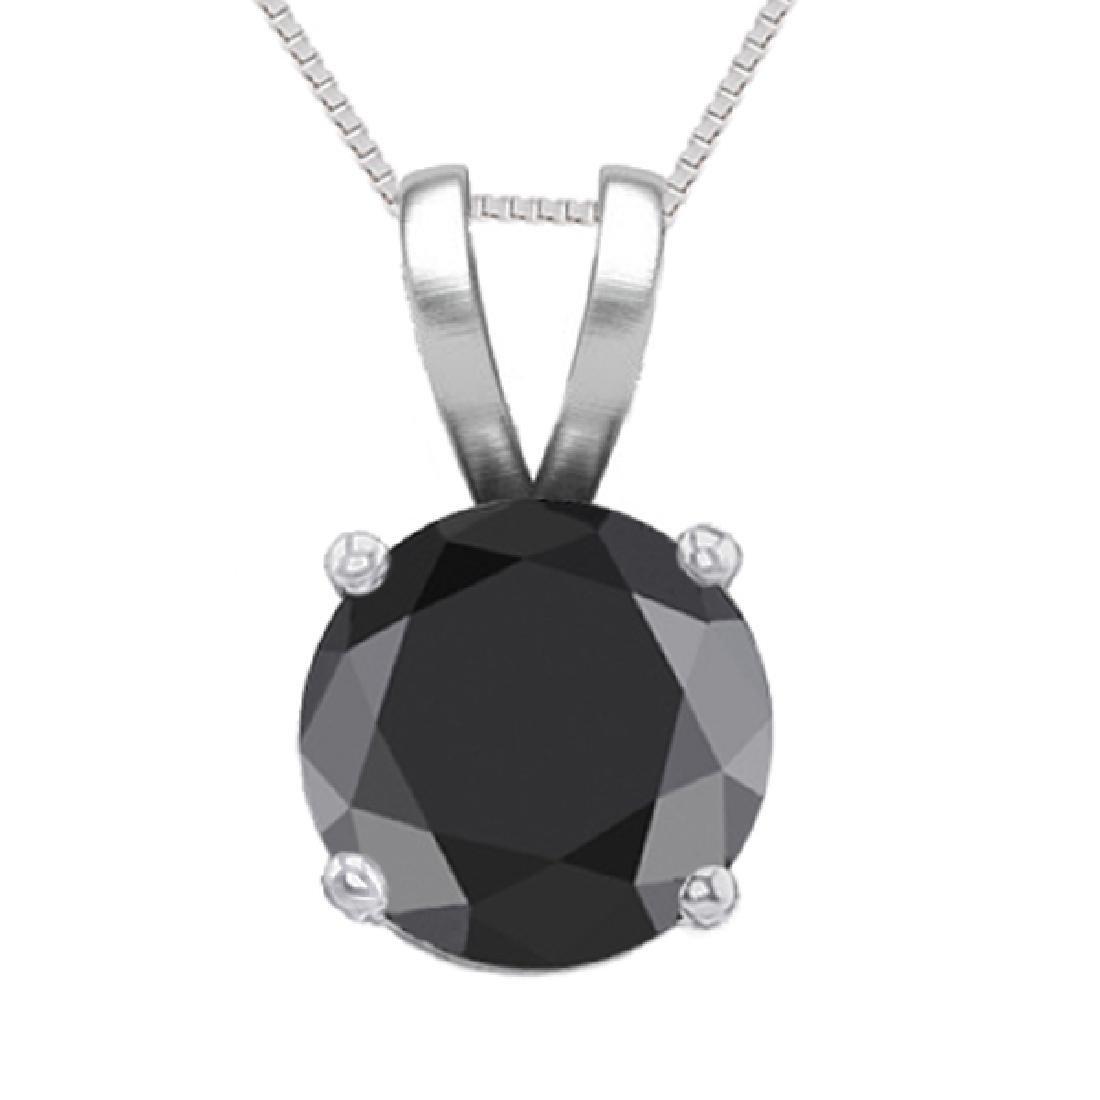 14K White Gold 1.02 ct Black Diamond Solitaire Necklace